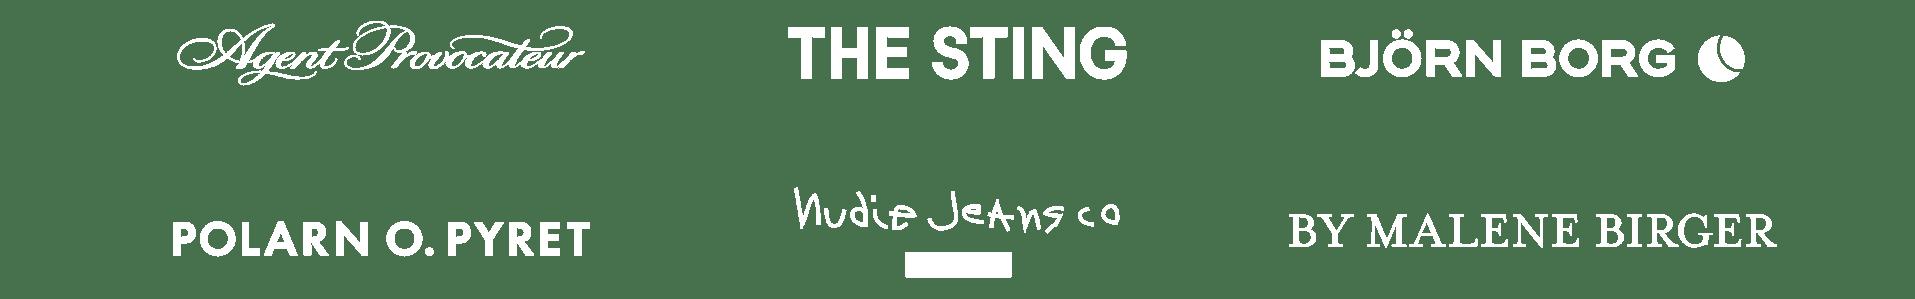 Logos demo page white